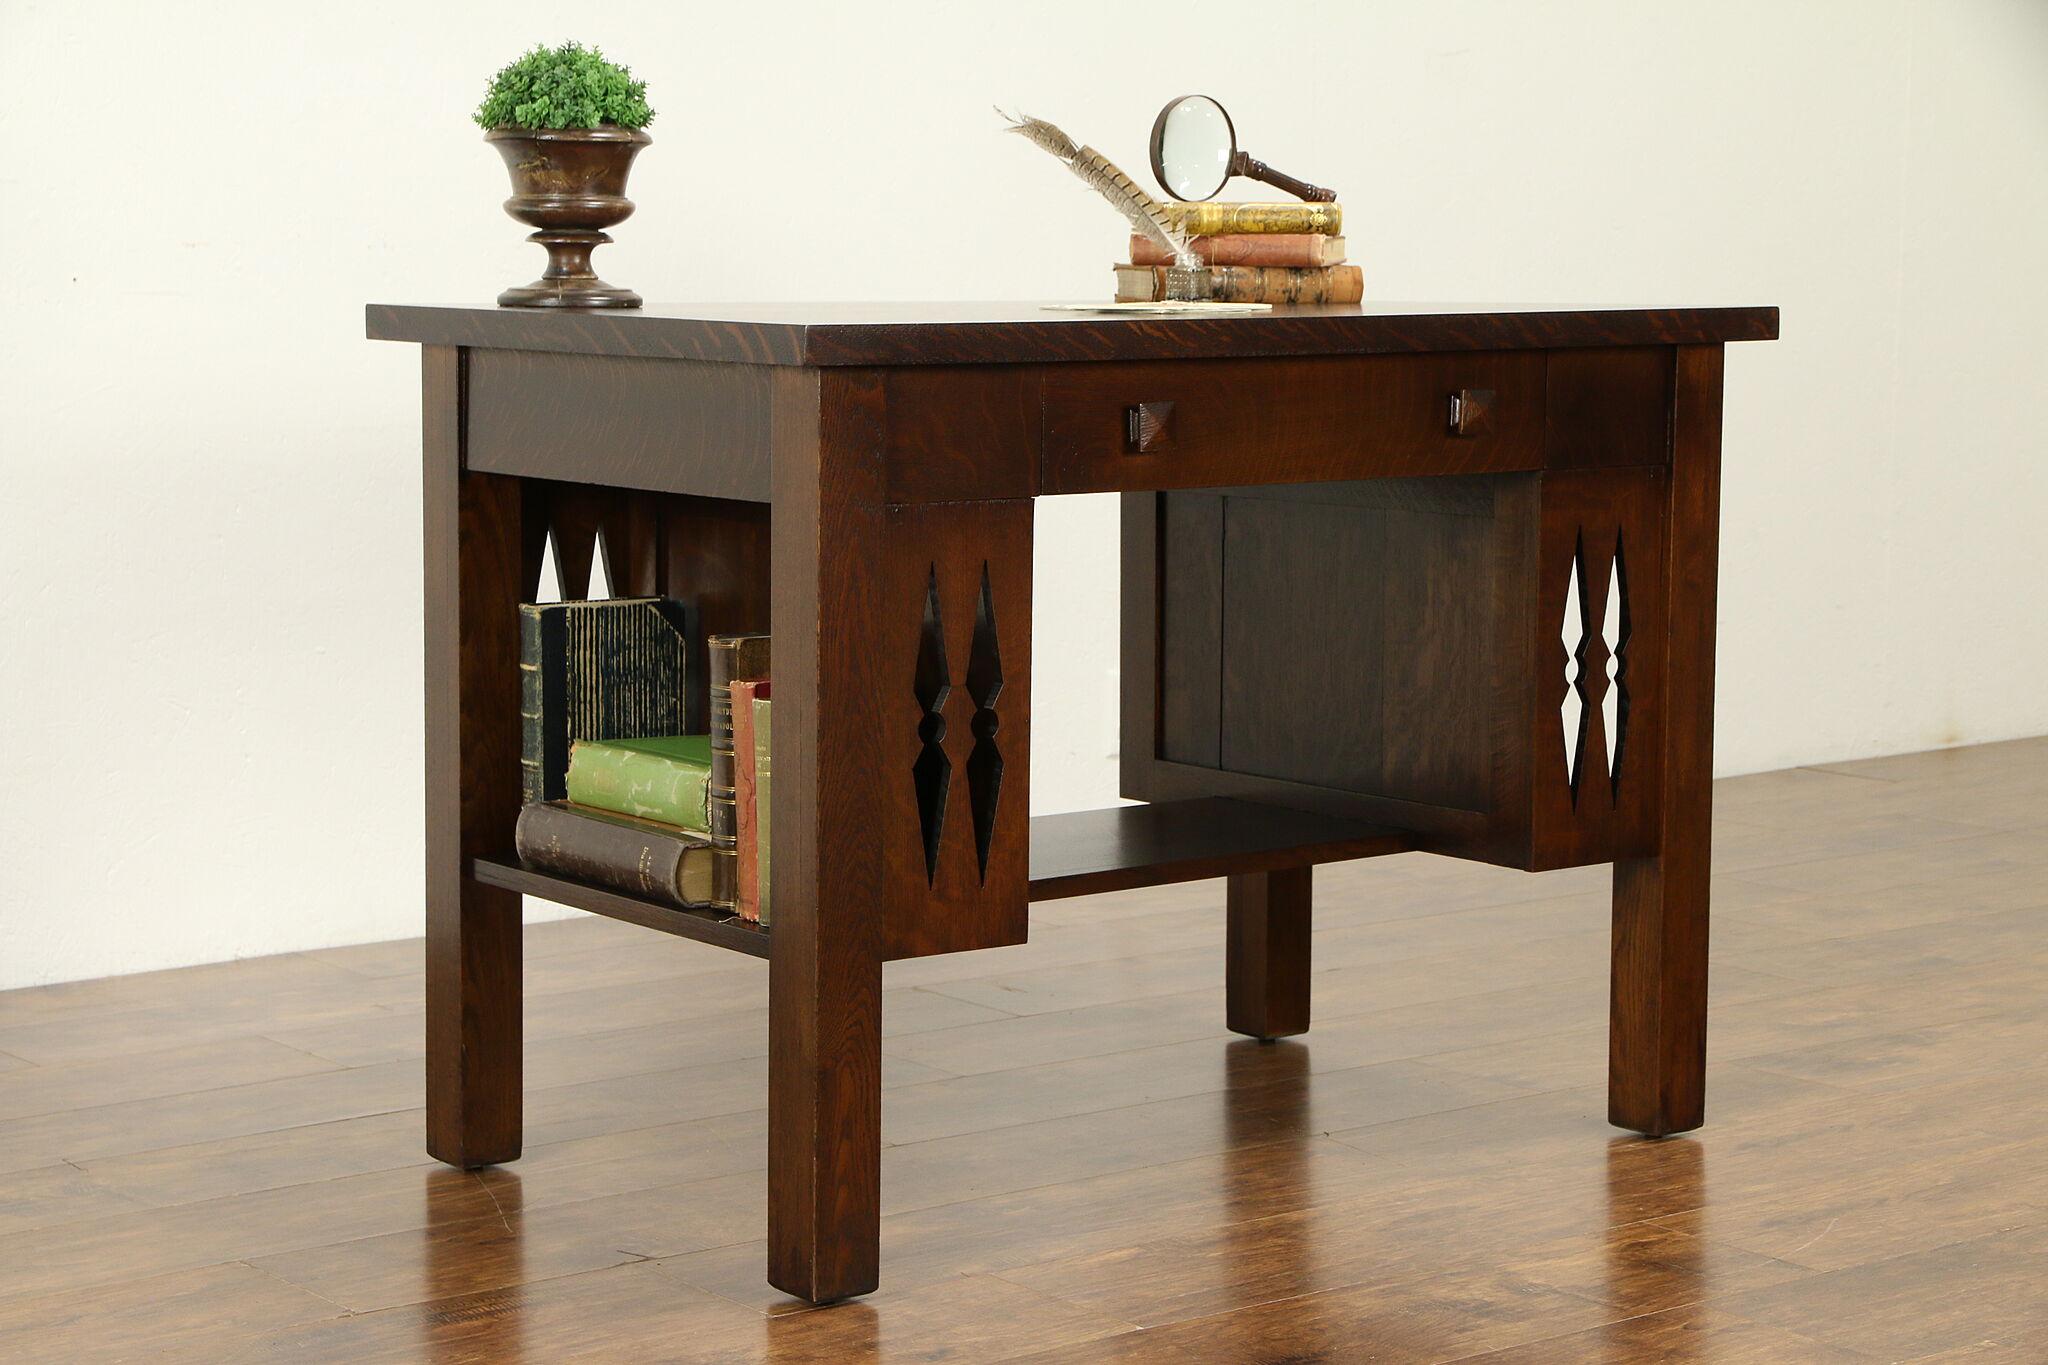 Sold Arts Crafts Mission Oak Antique Craftsman Library Table Desk 31941 Harp Gallery Antiques Furniture